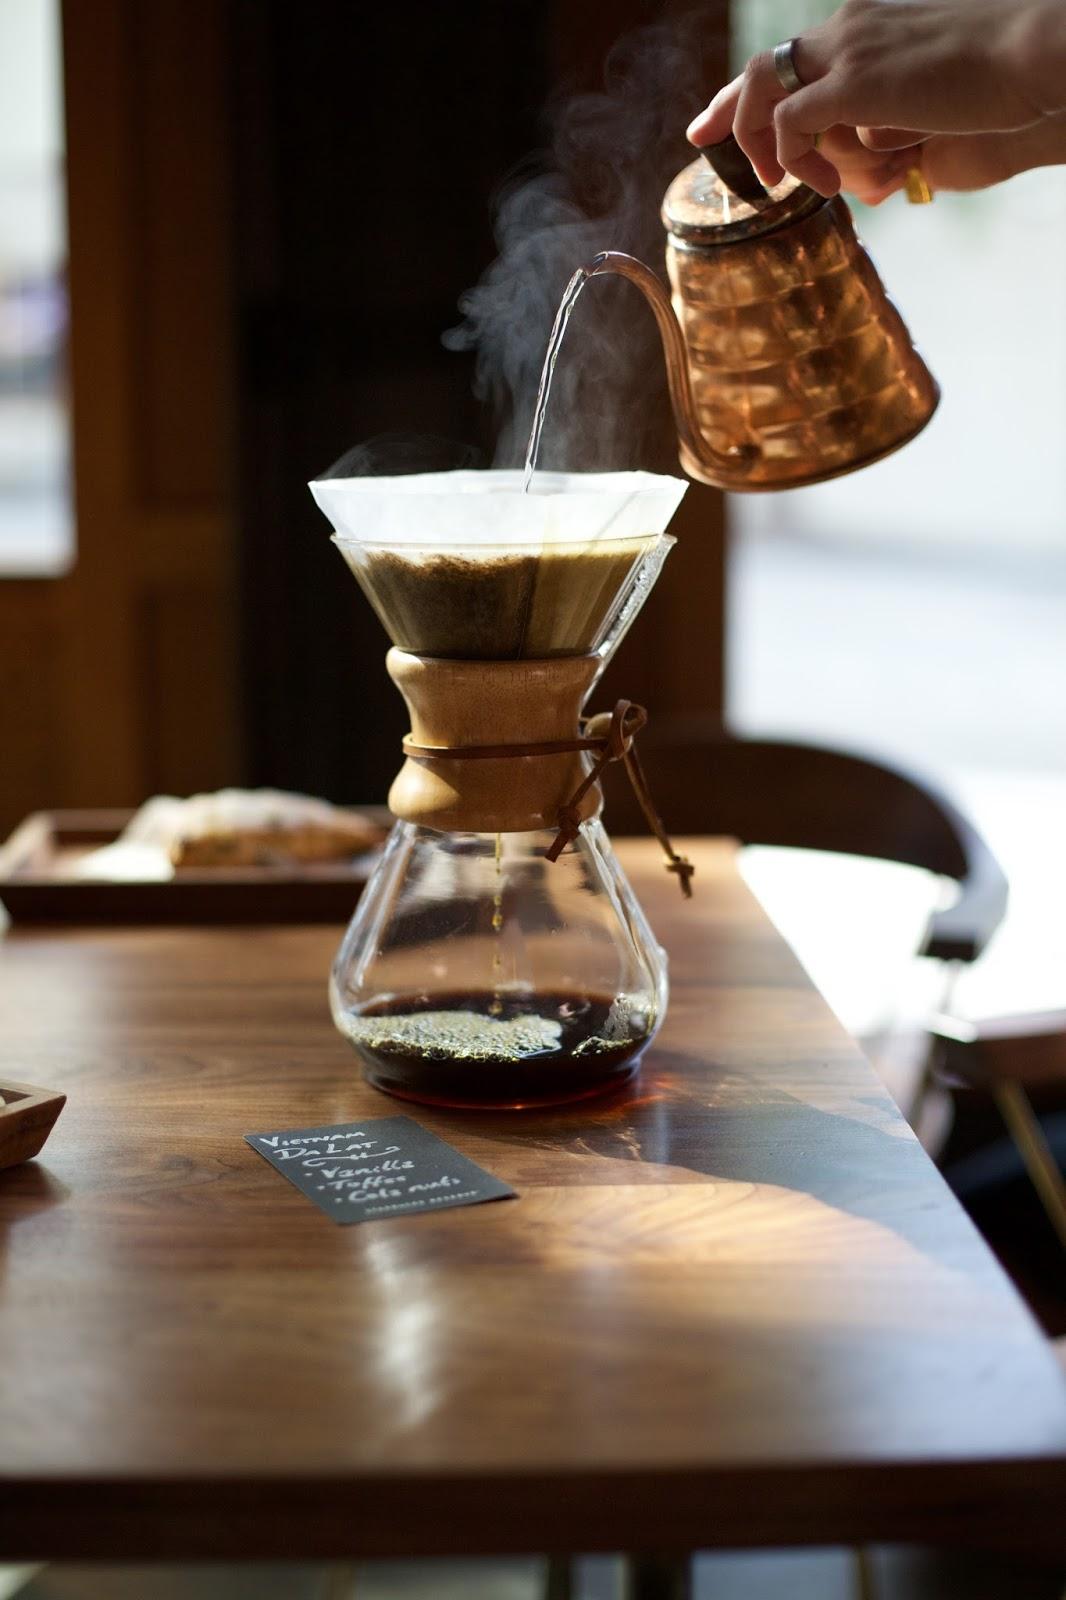 Starbucks Coffee Chemex brewing method